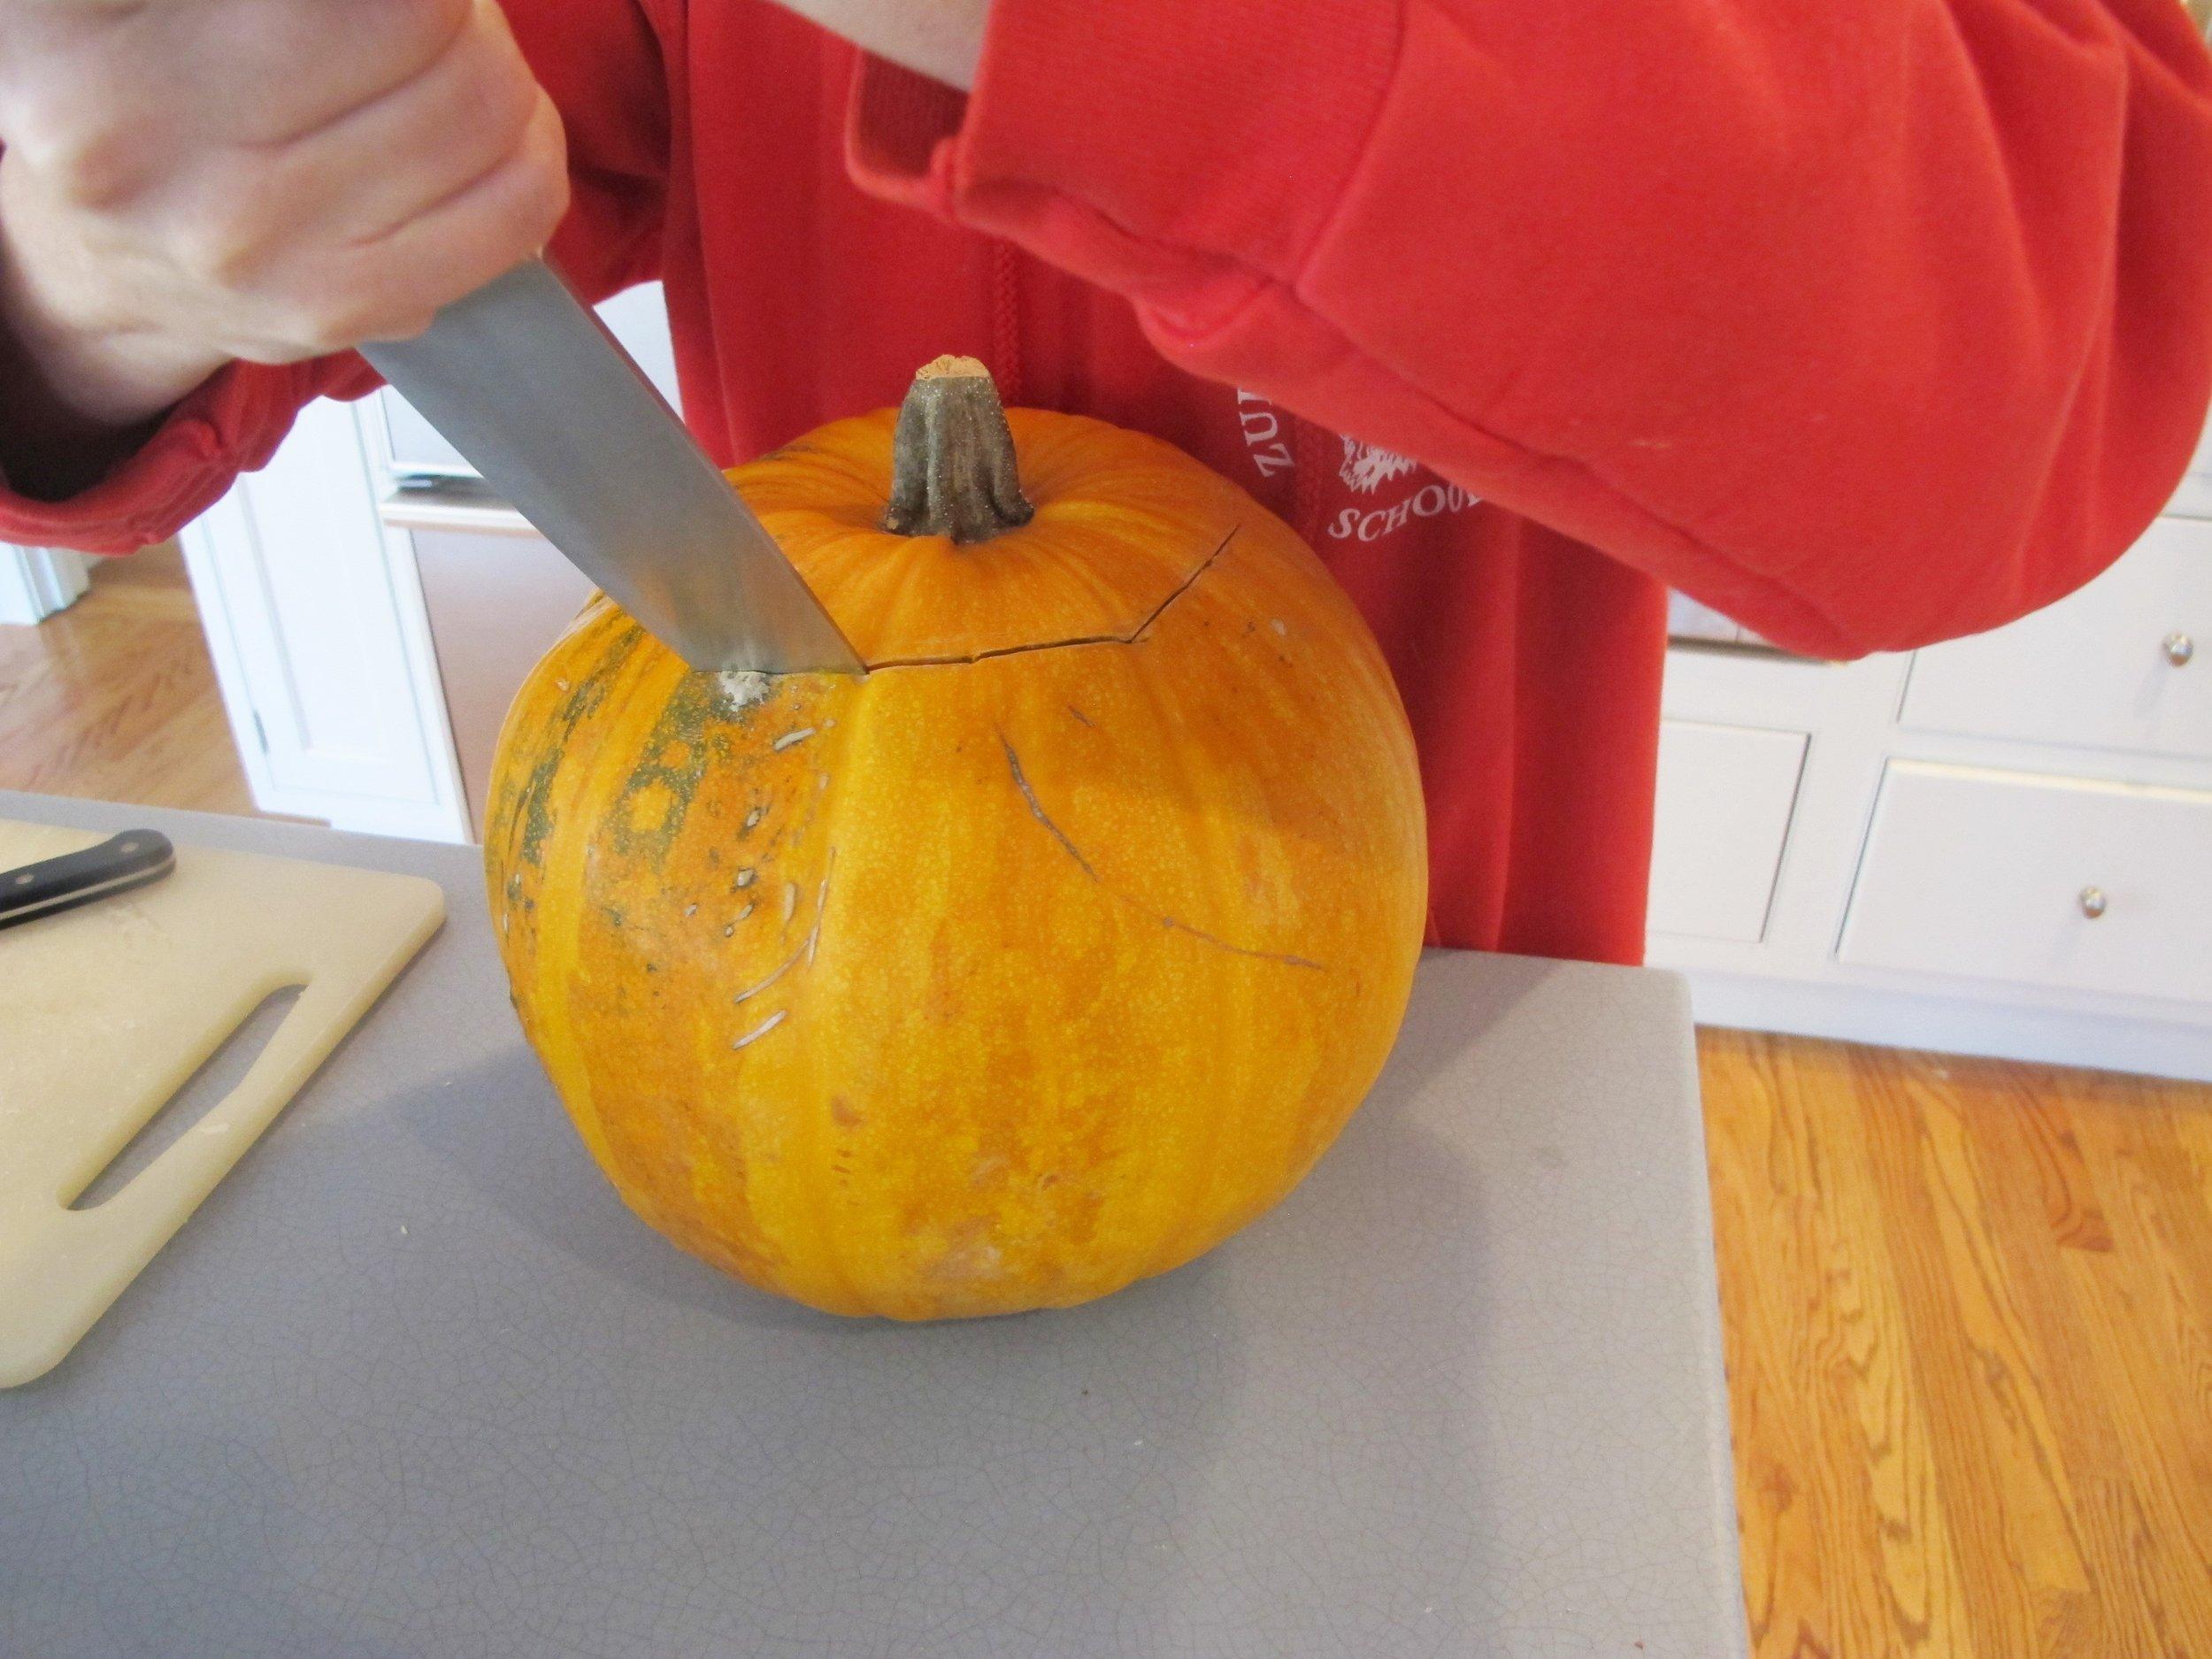 Zucca_al_Forno_Roasted_Pumpkin_with_Cheese-Mushroom_11.JPG